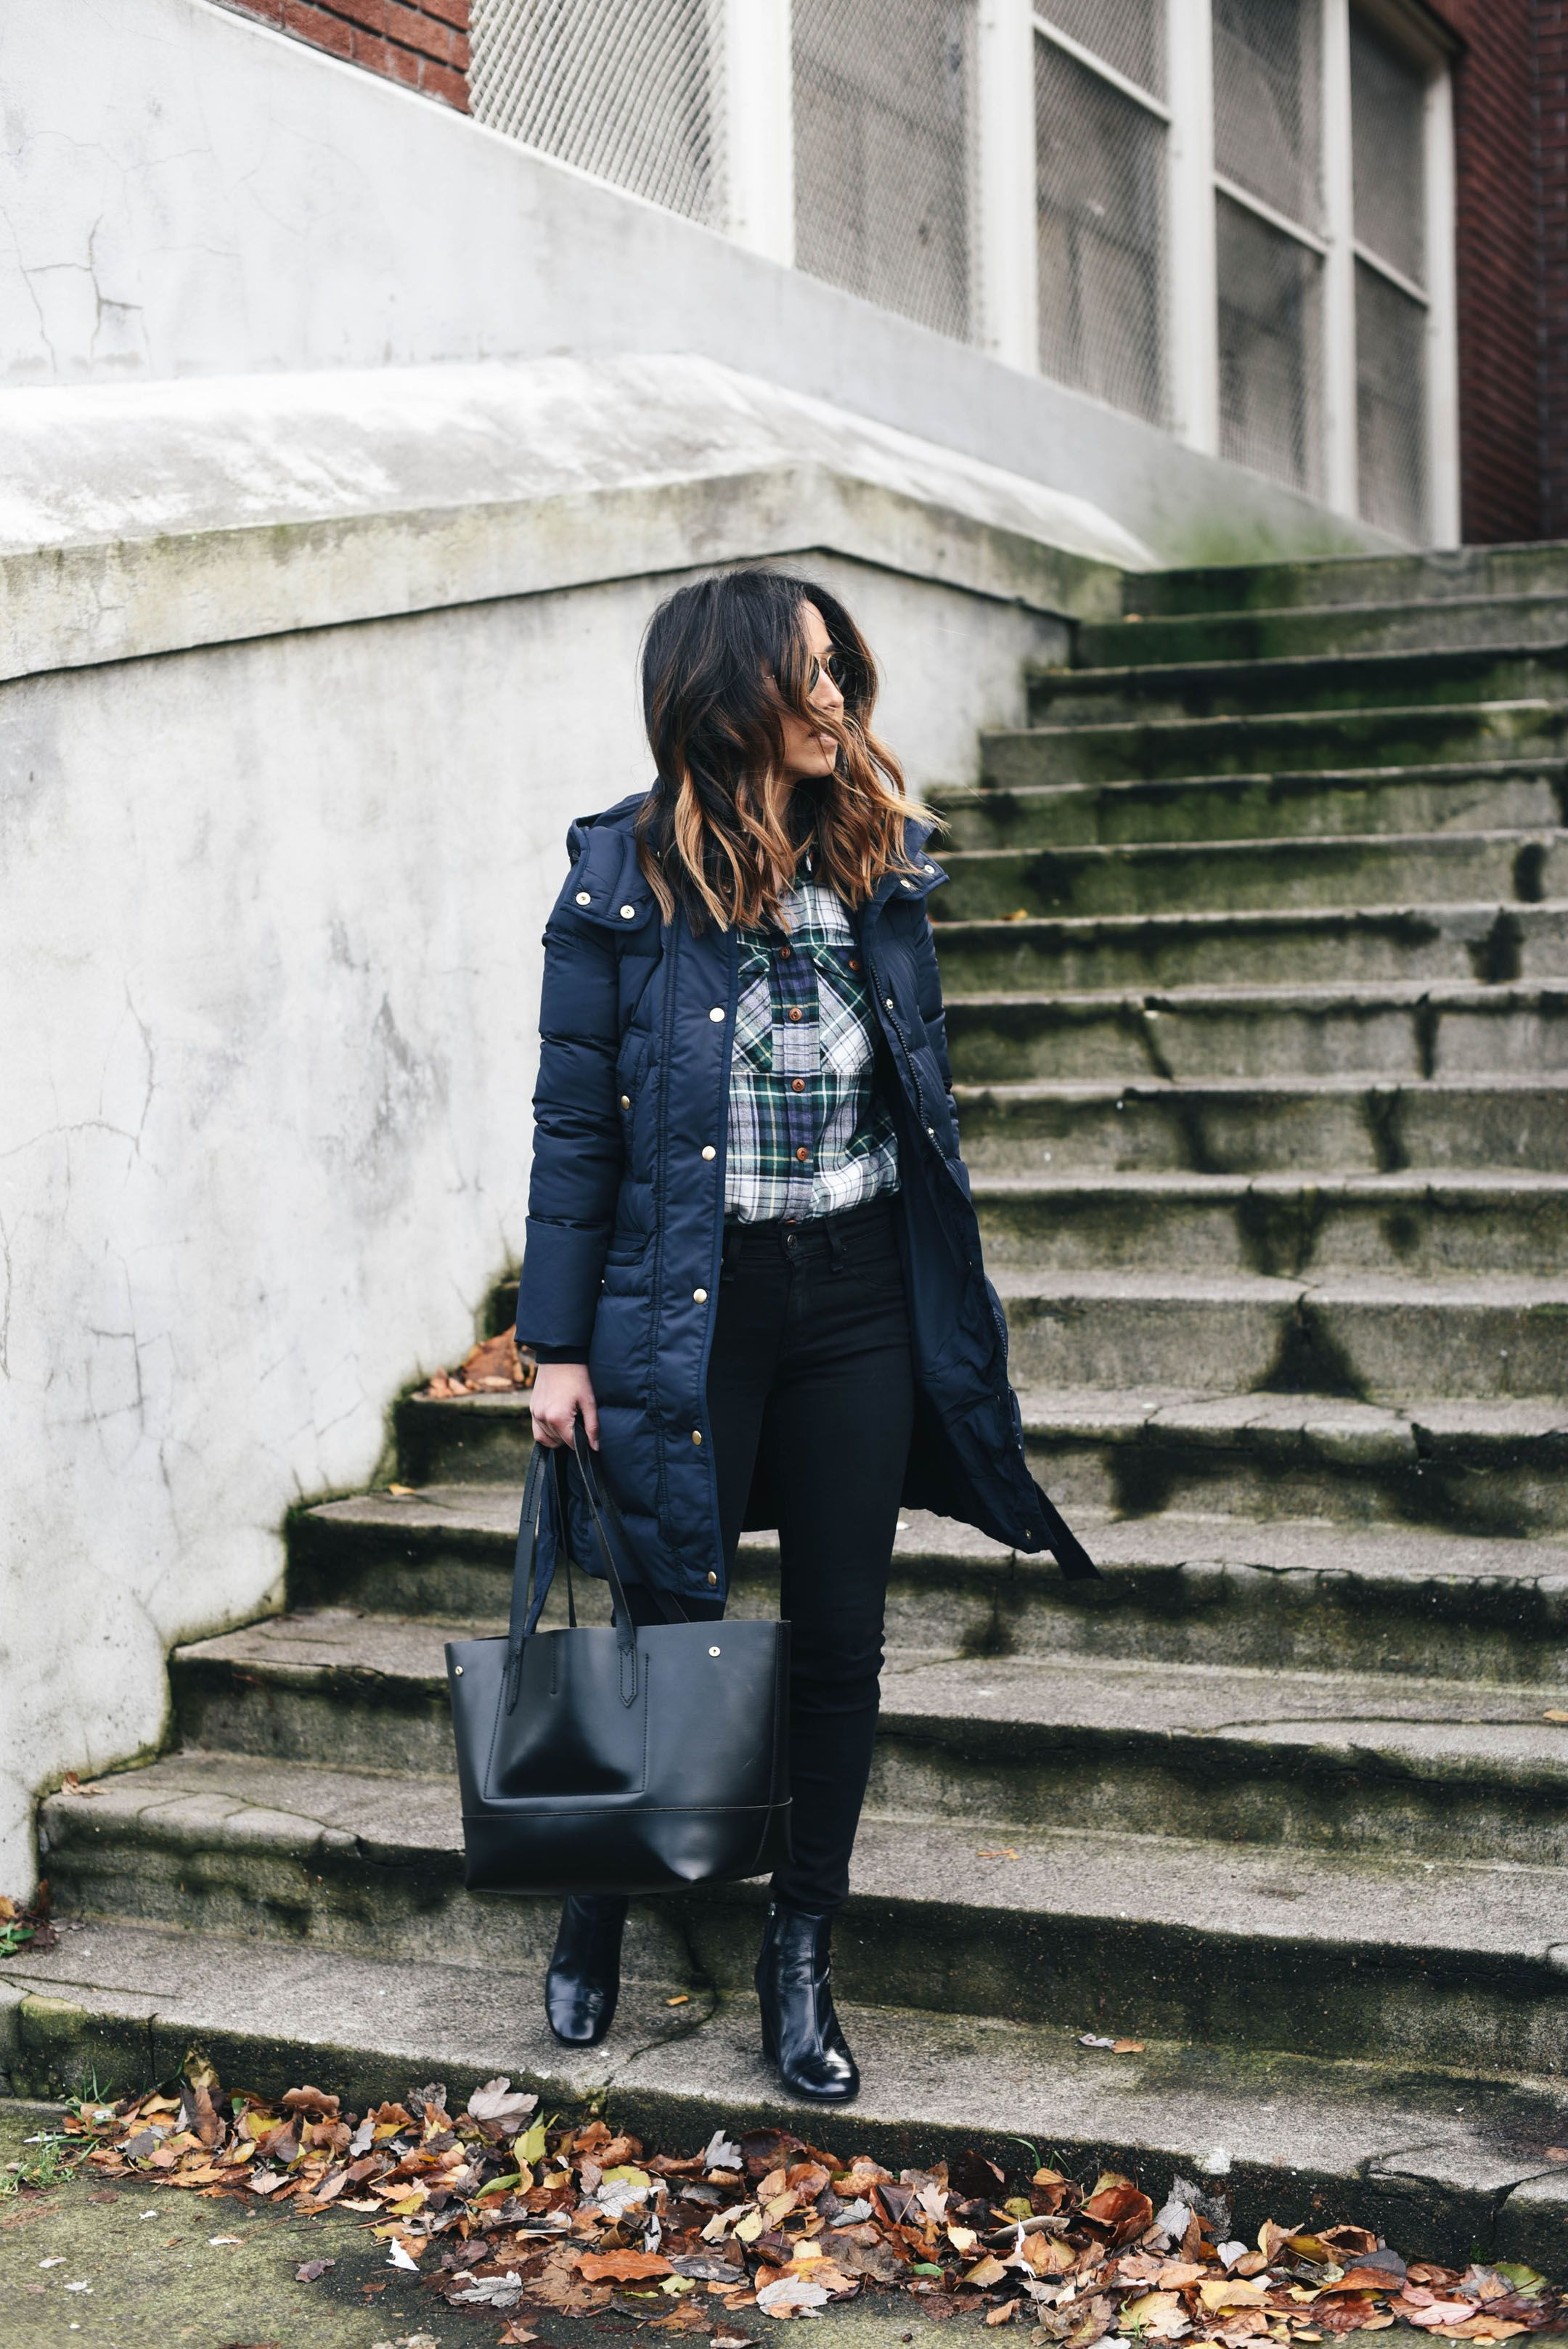 Flannel shirt jeans  jcrewplaidshirt  style  Pinterest  Plaid Crystalin marie and